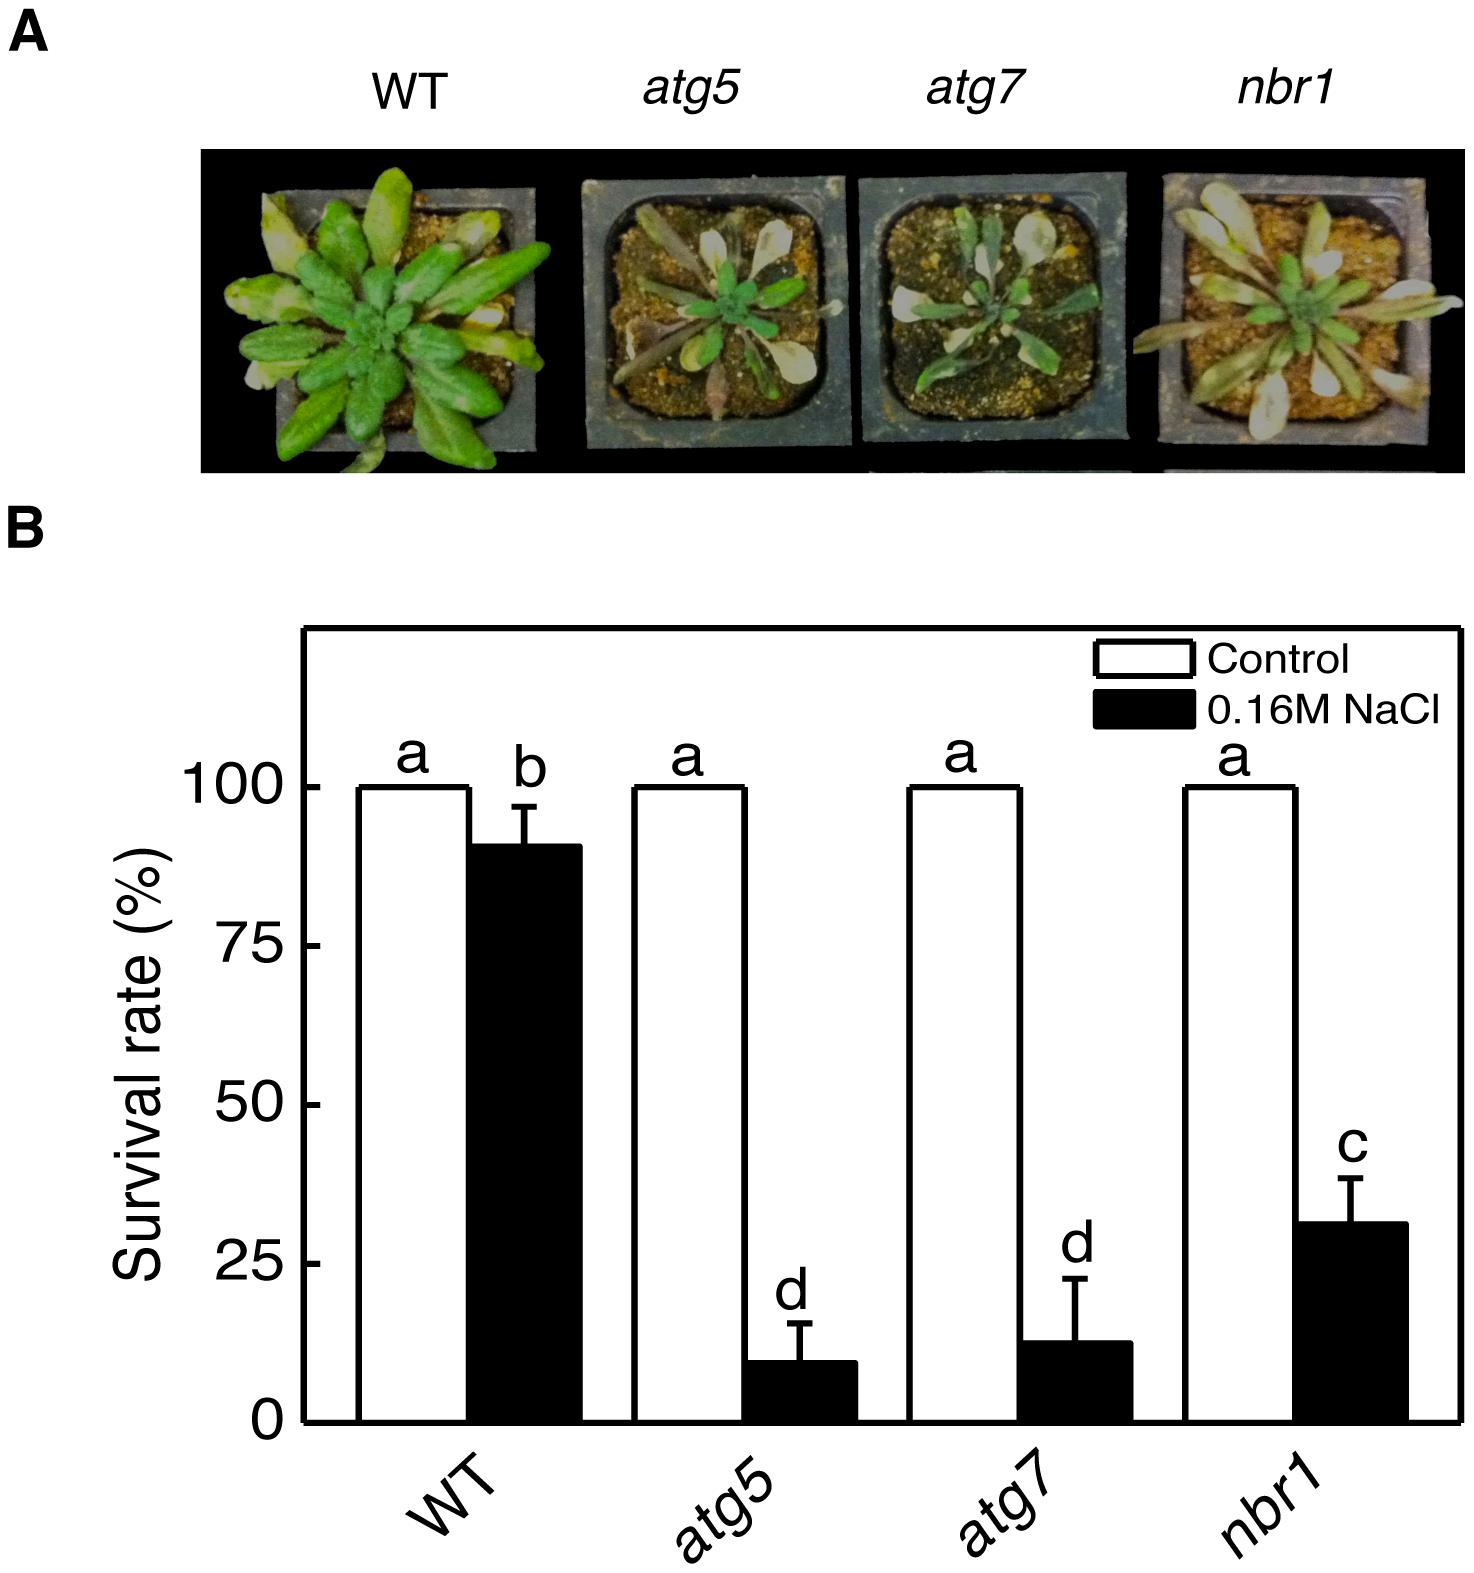 Enhanced sensitivity of <i>atg5</i>, <i>atg7</i>, and <i>nbr1</i> mutants to drought and salt stresses.